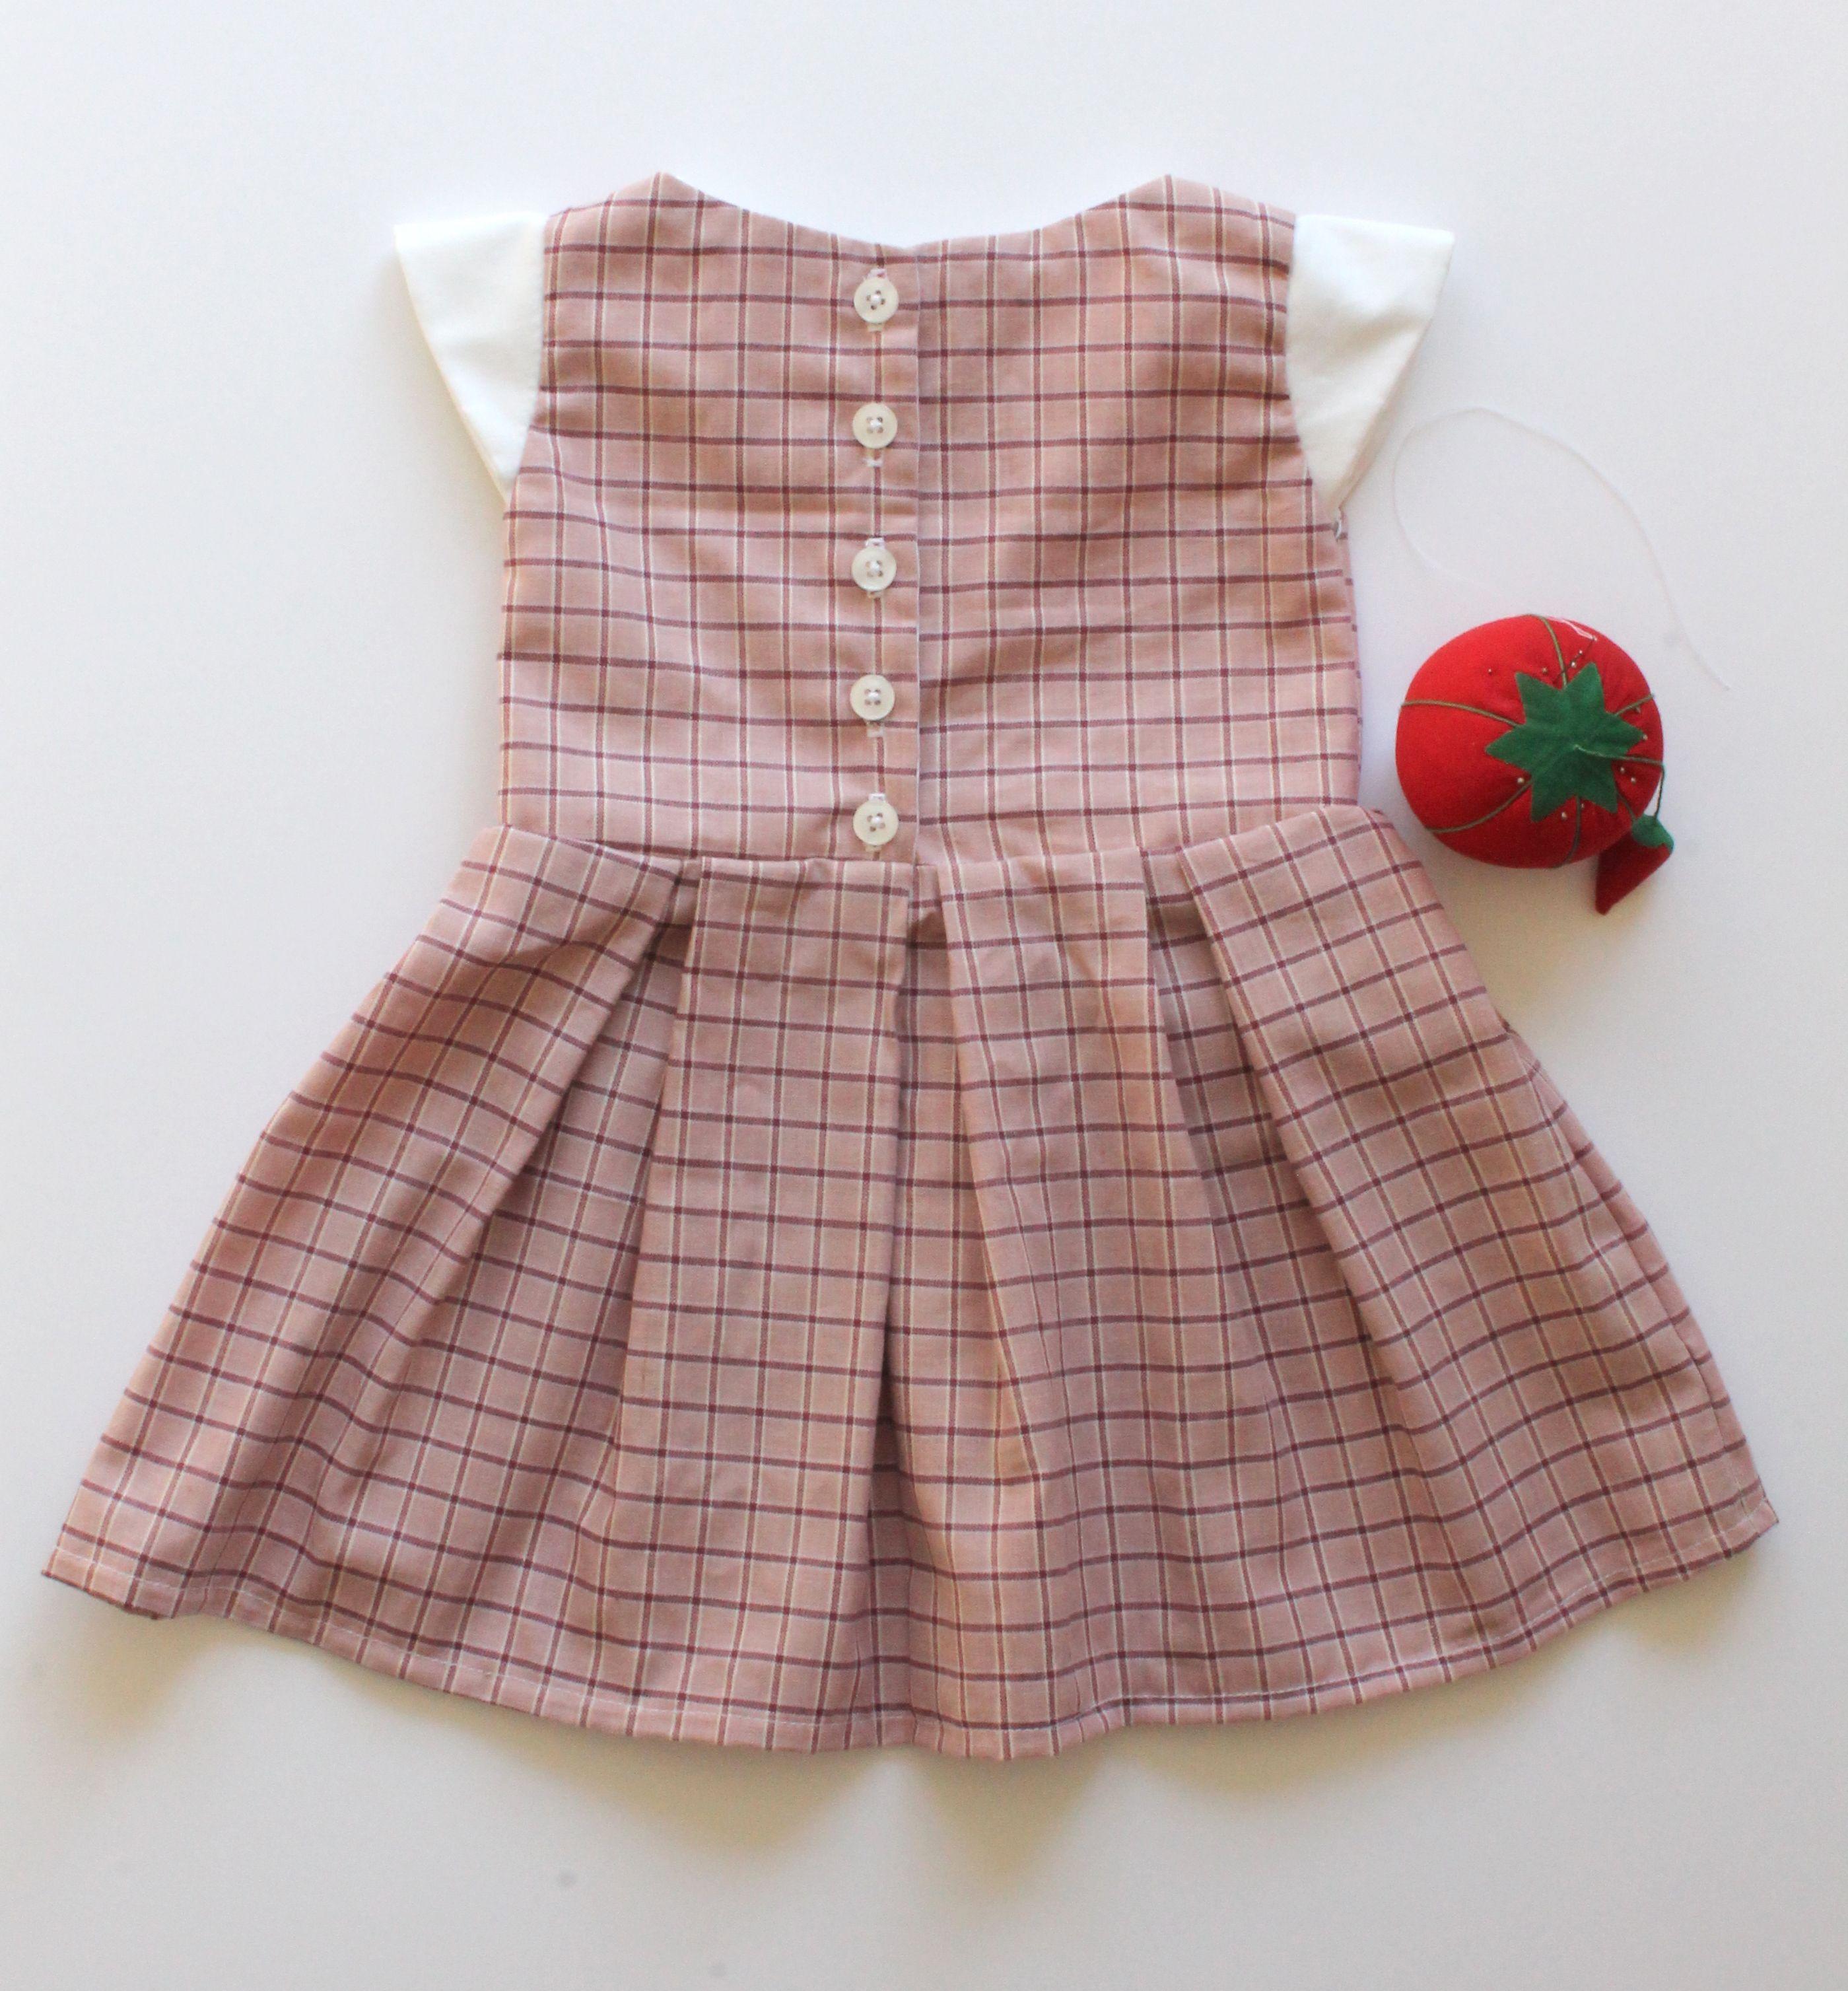 Baby Girl Pink Plaid Tartan School Jumper Dress or Top 3 6 Month